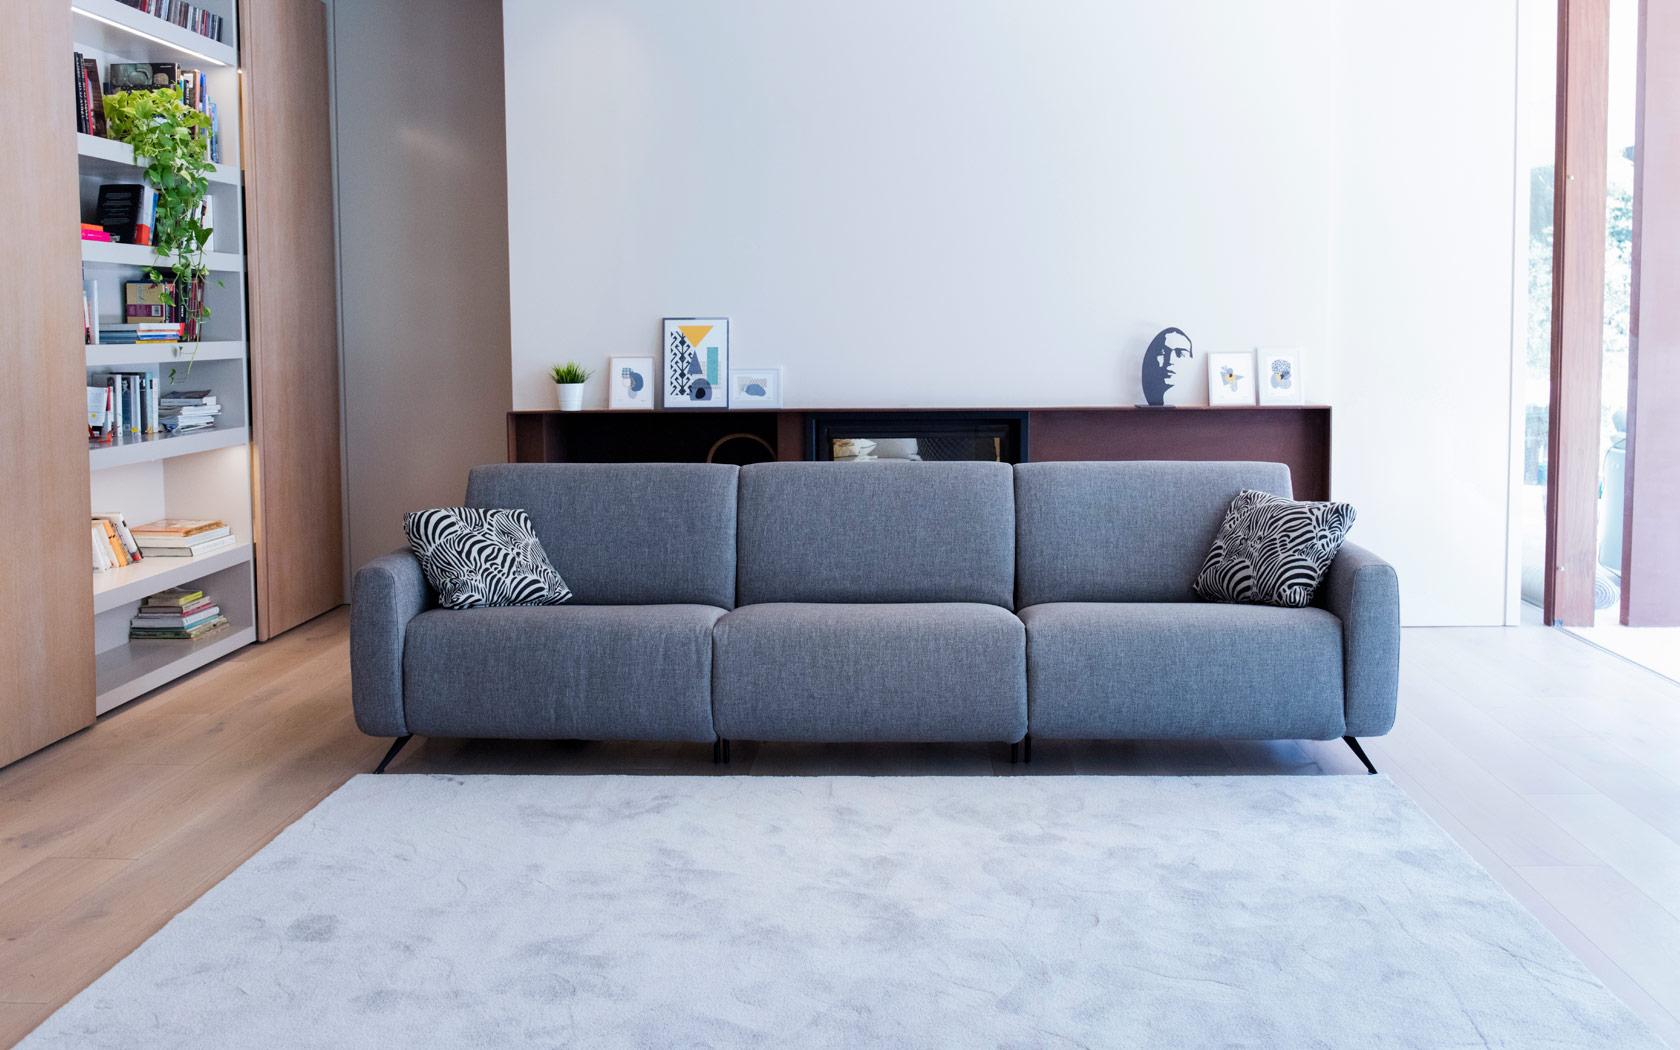 Atlanta sofa relax 2020 09